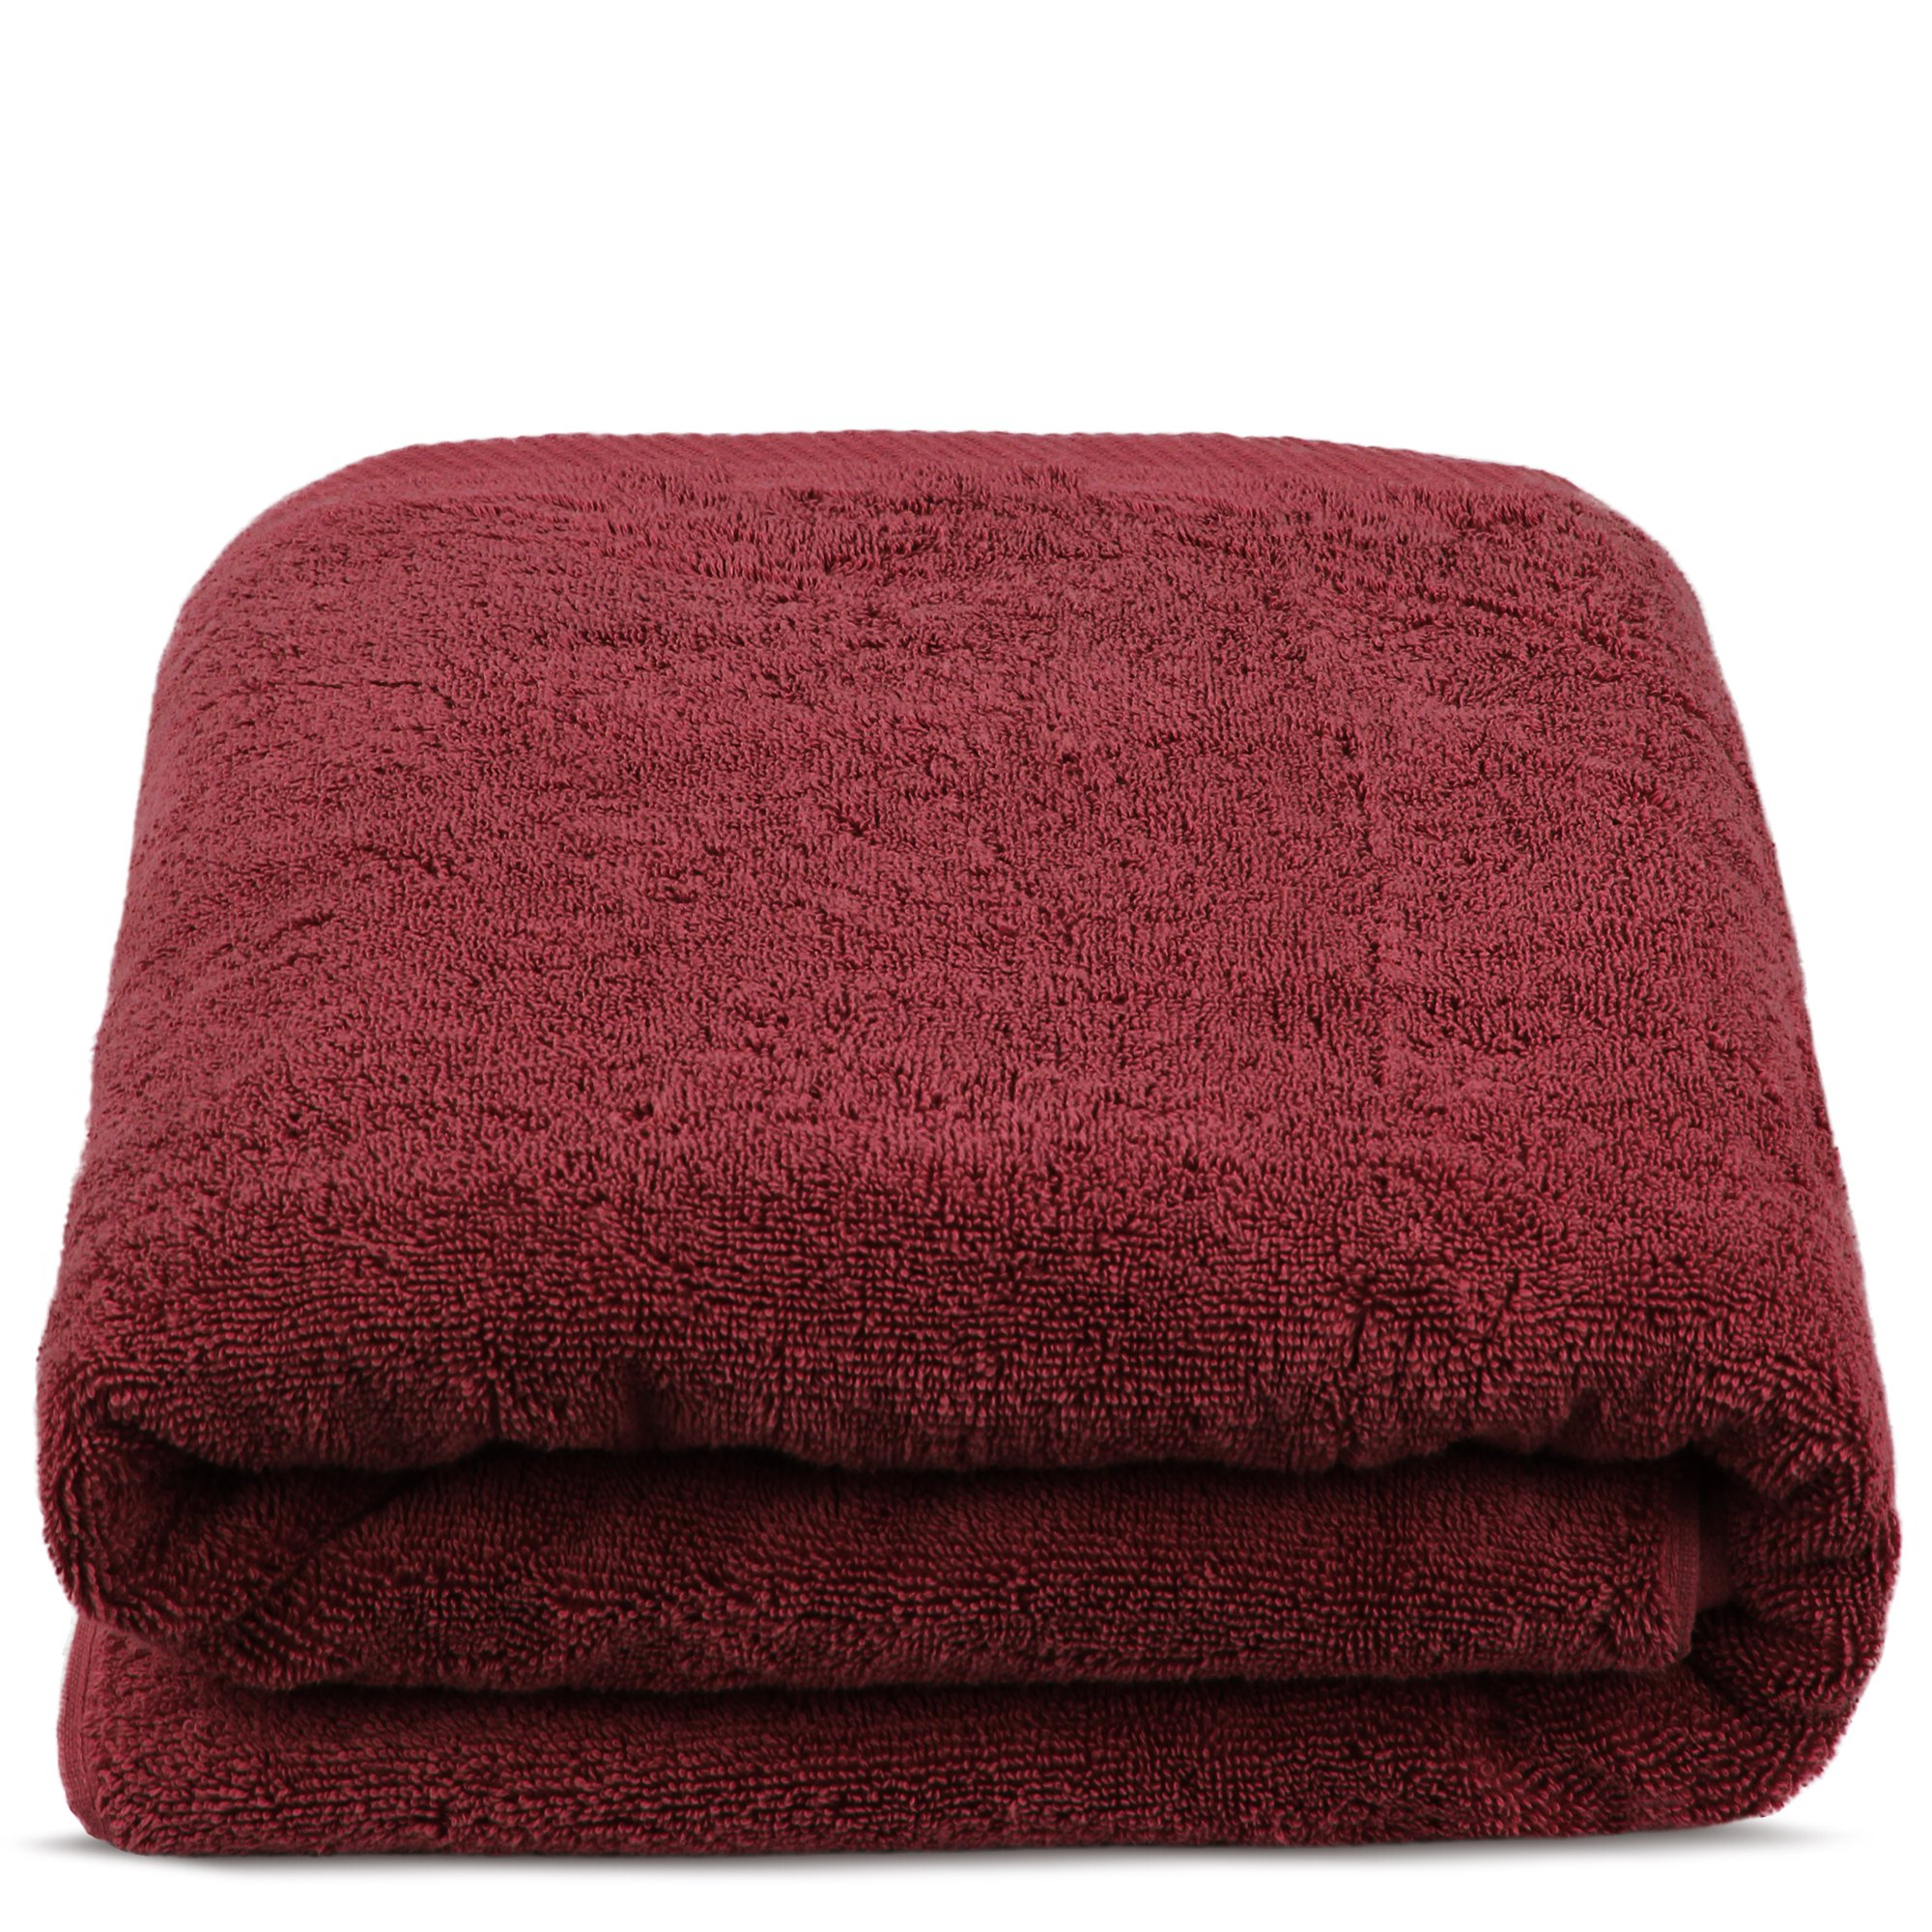 TURKUOISE TURKISH TOWEL % 100 Turkish Cotton Luxury and Super Soft Towels (Bath Sheet Oversize, Cranberry)